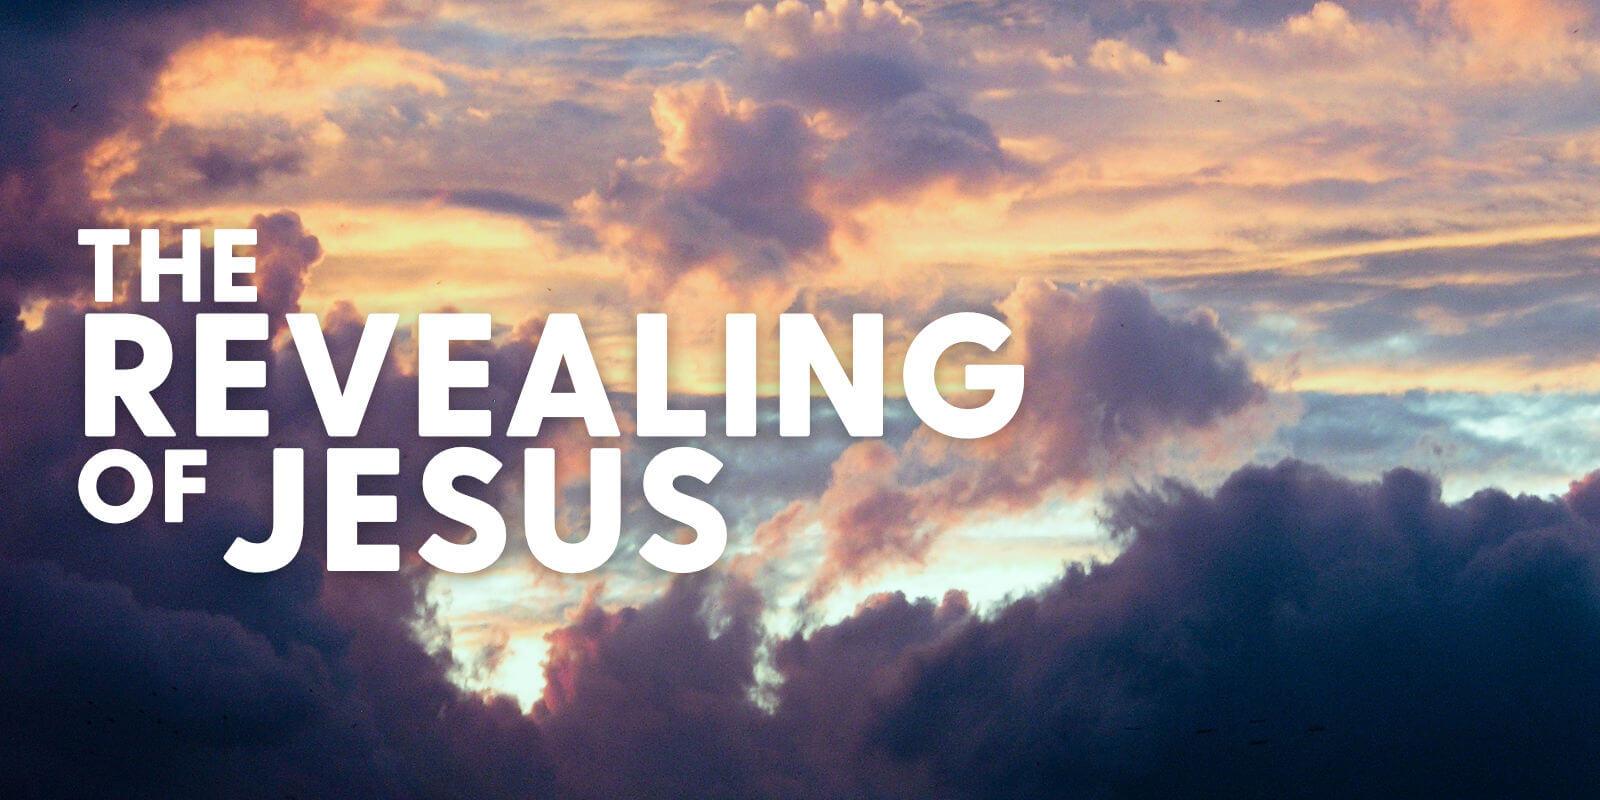 The Revealing of Jesus